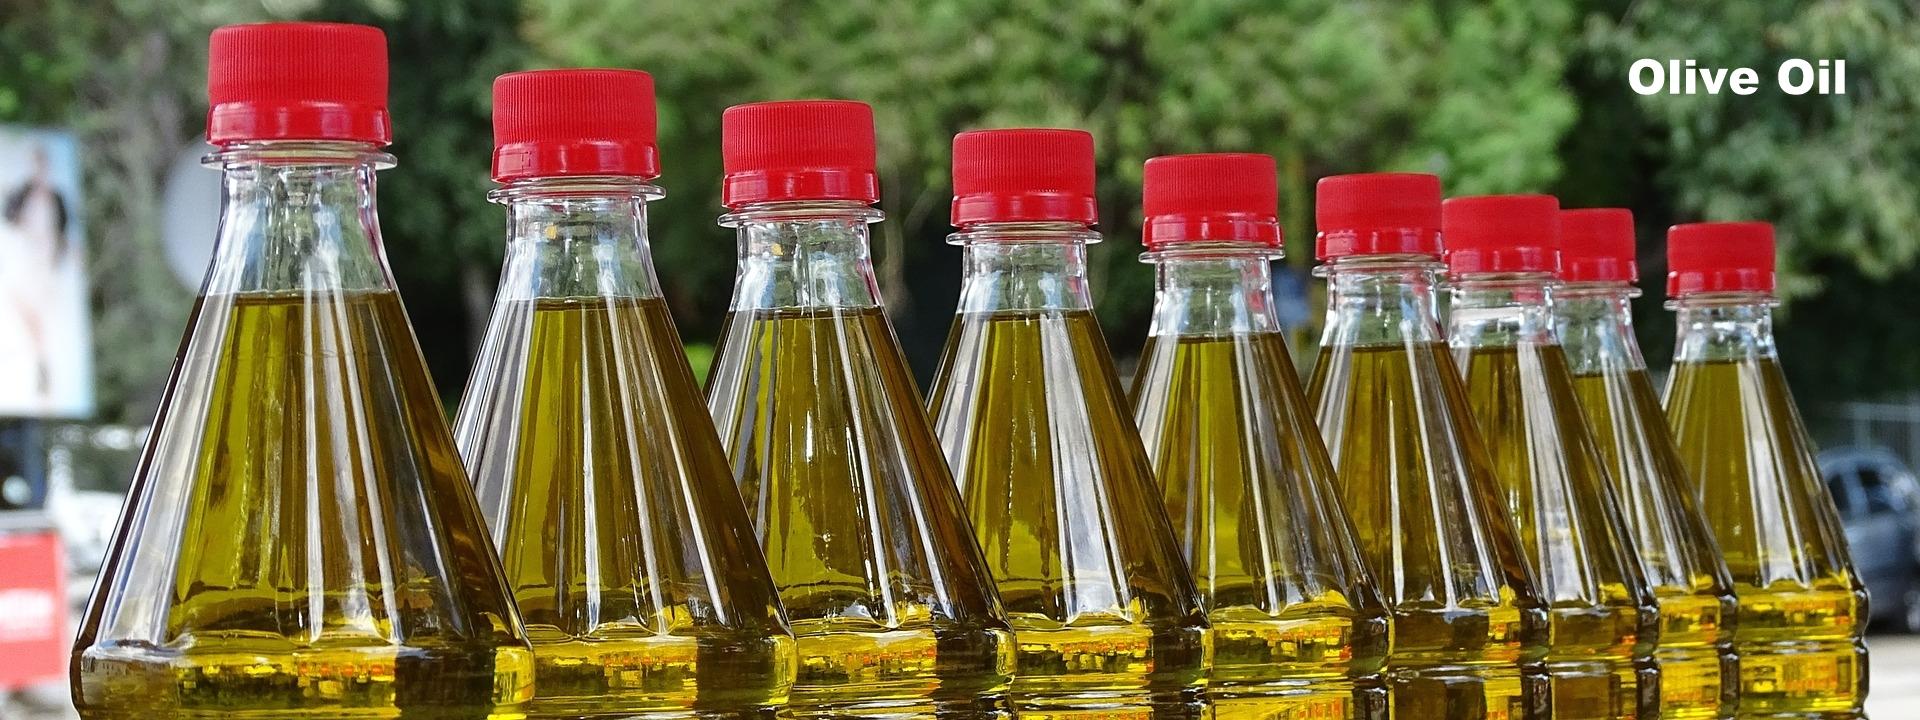 Olive Oil - Edible Oil